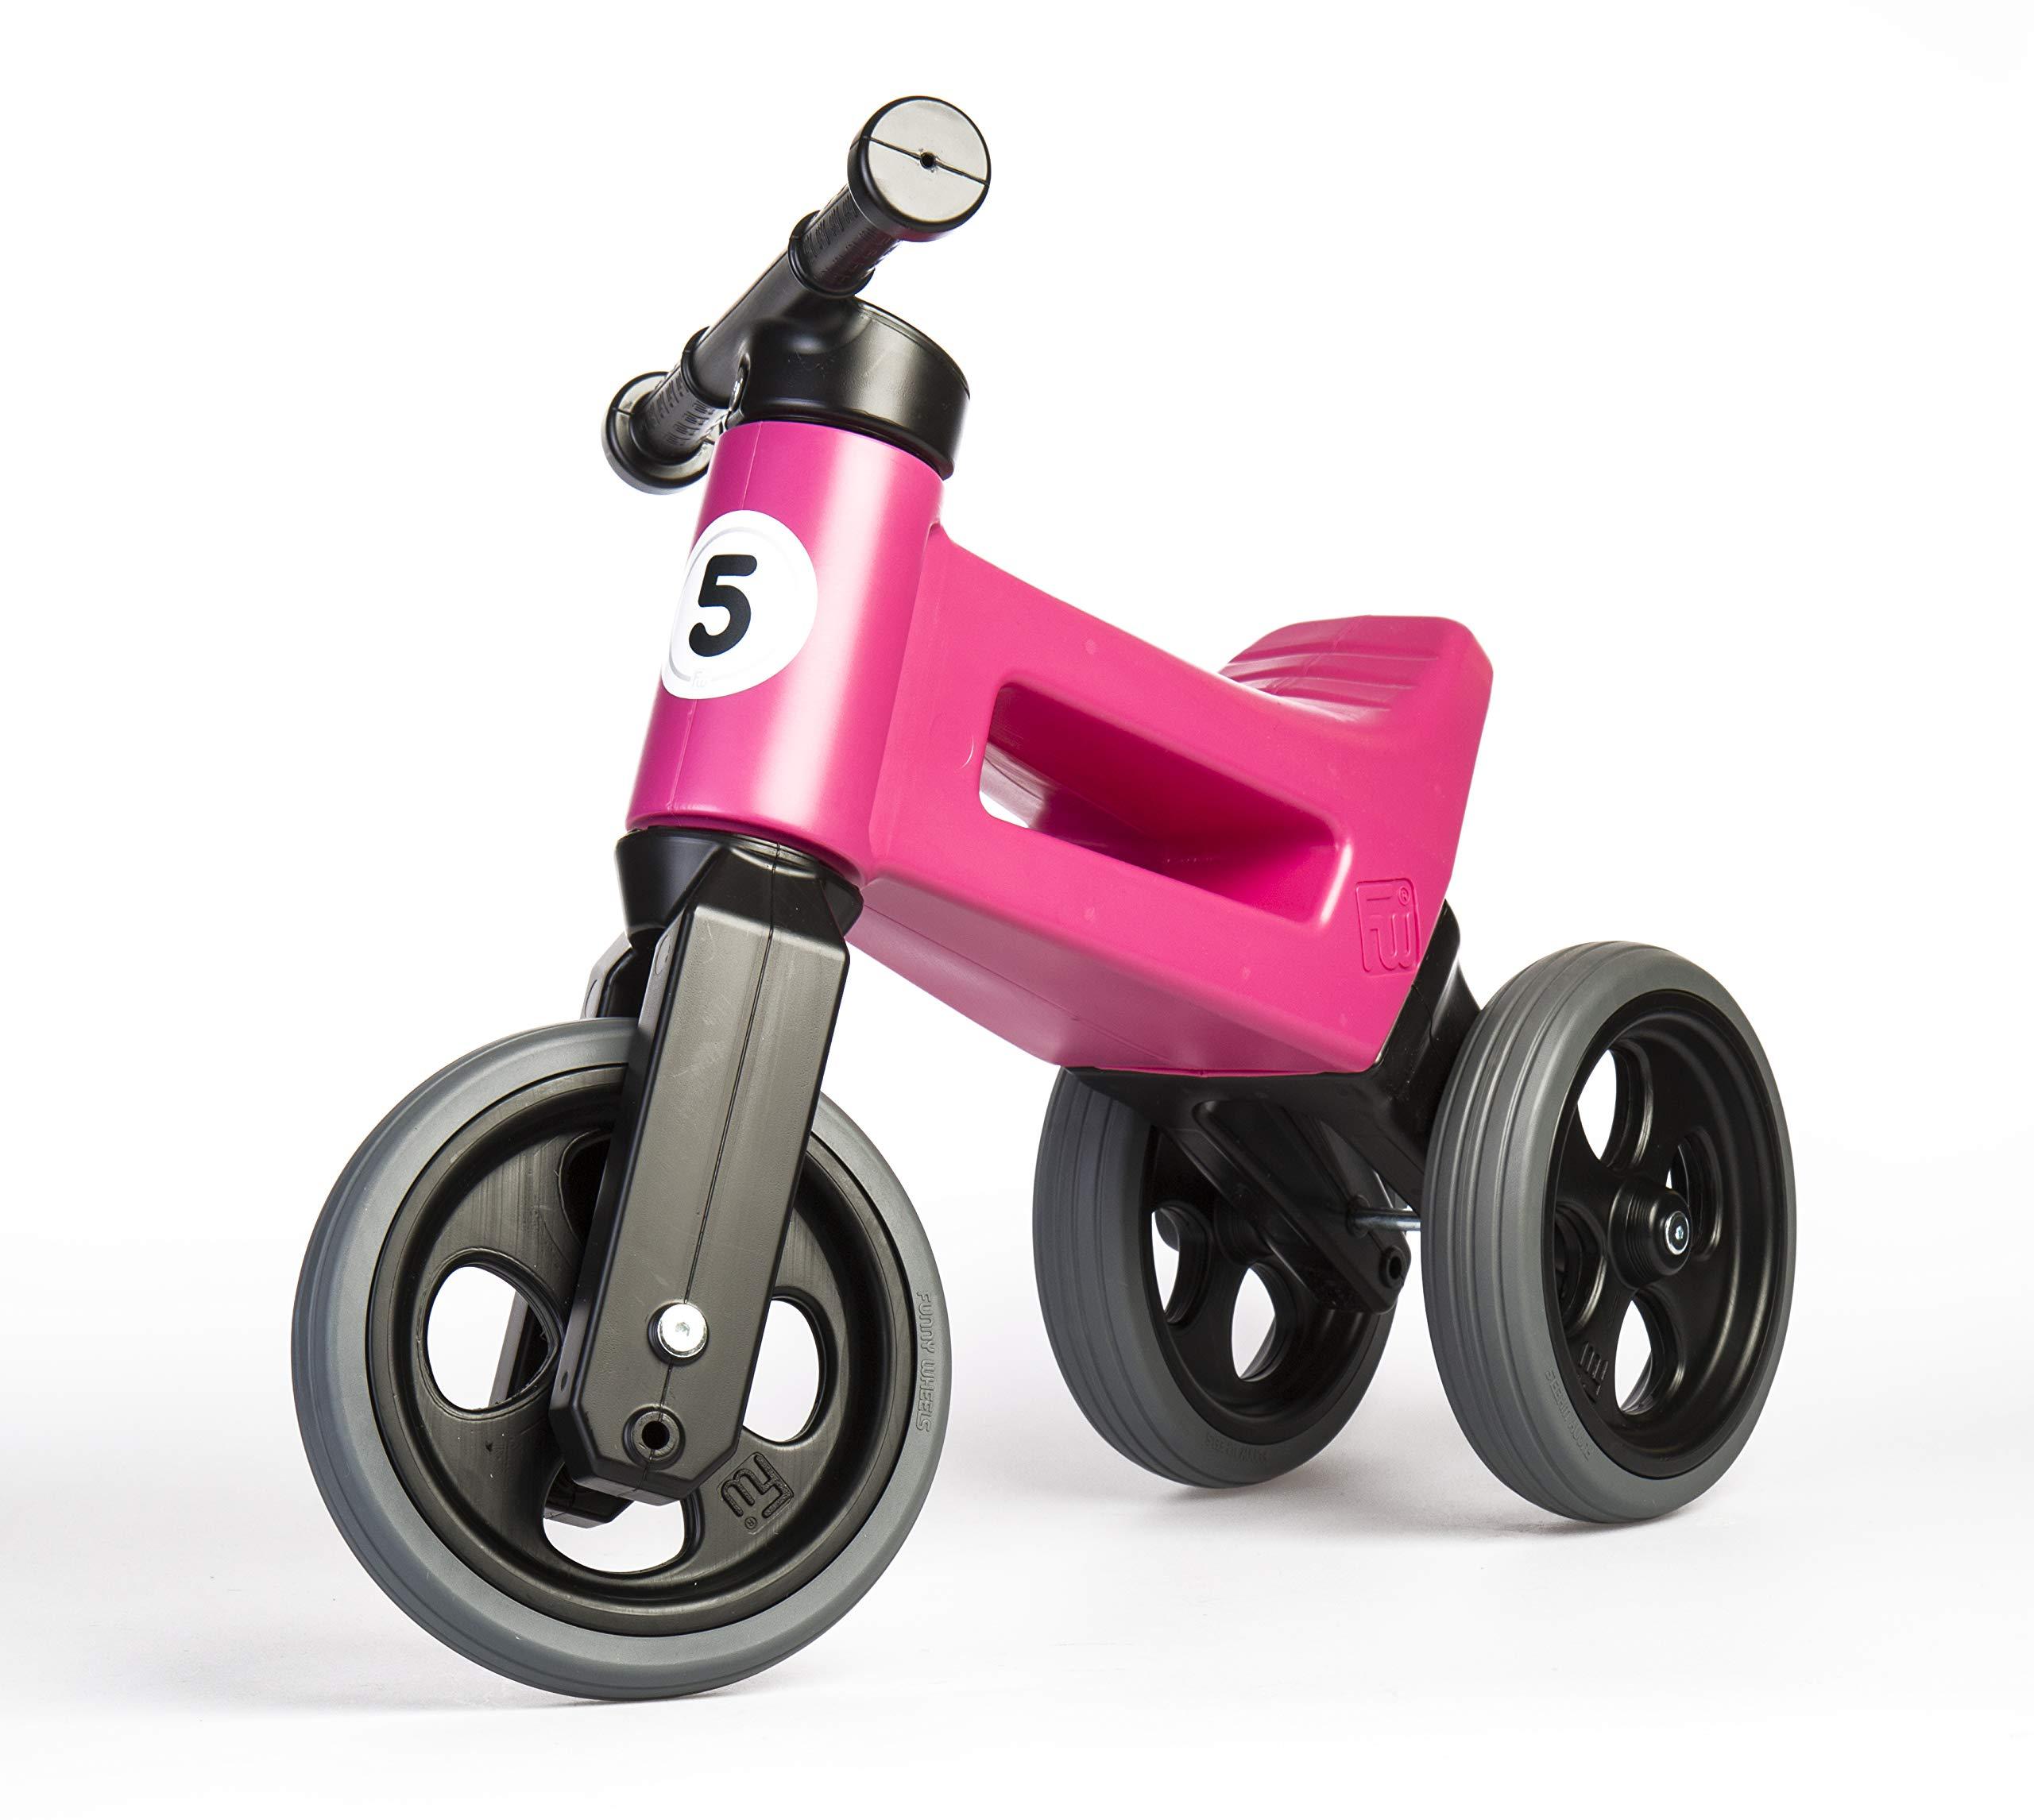 PlayMonster Free Wheelin' Rider Convertible Balance Bike, Pink by PlayMonster (Image #1)